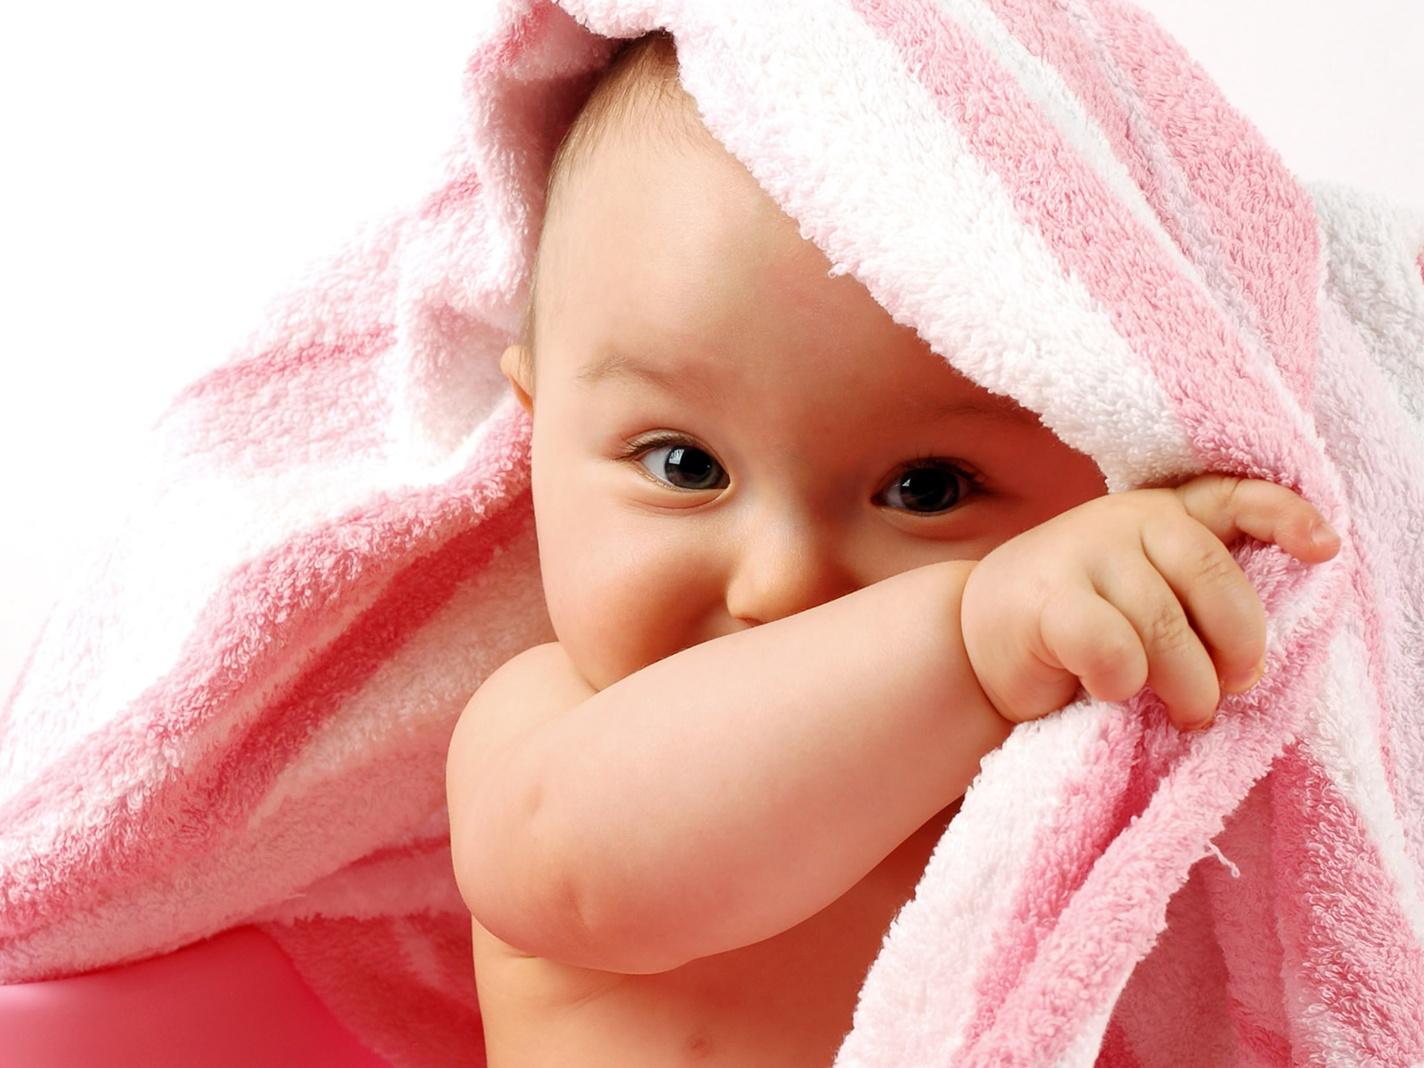 Wallpaper Wallpaper Cute Baby Wallpaper 1424x1068